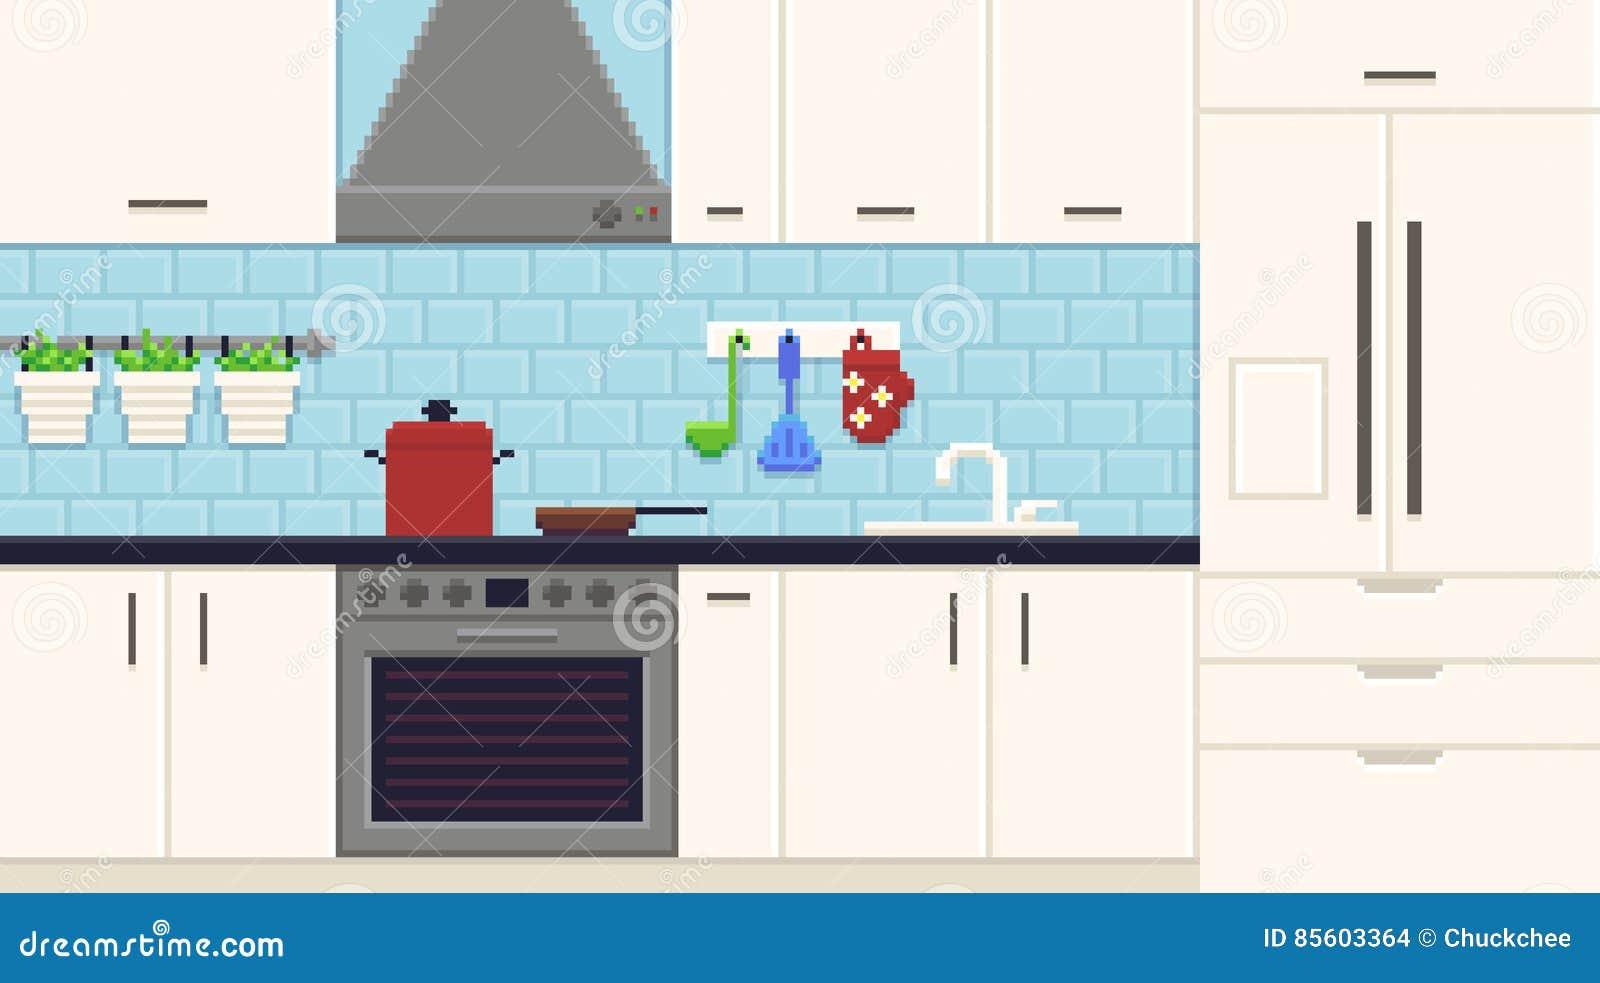 Pixel Art Kitchen stock vector. Illustration of domestic - 85603364